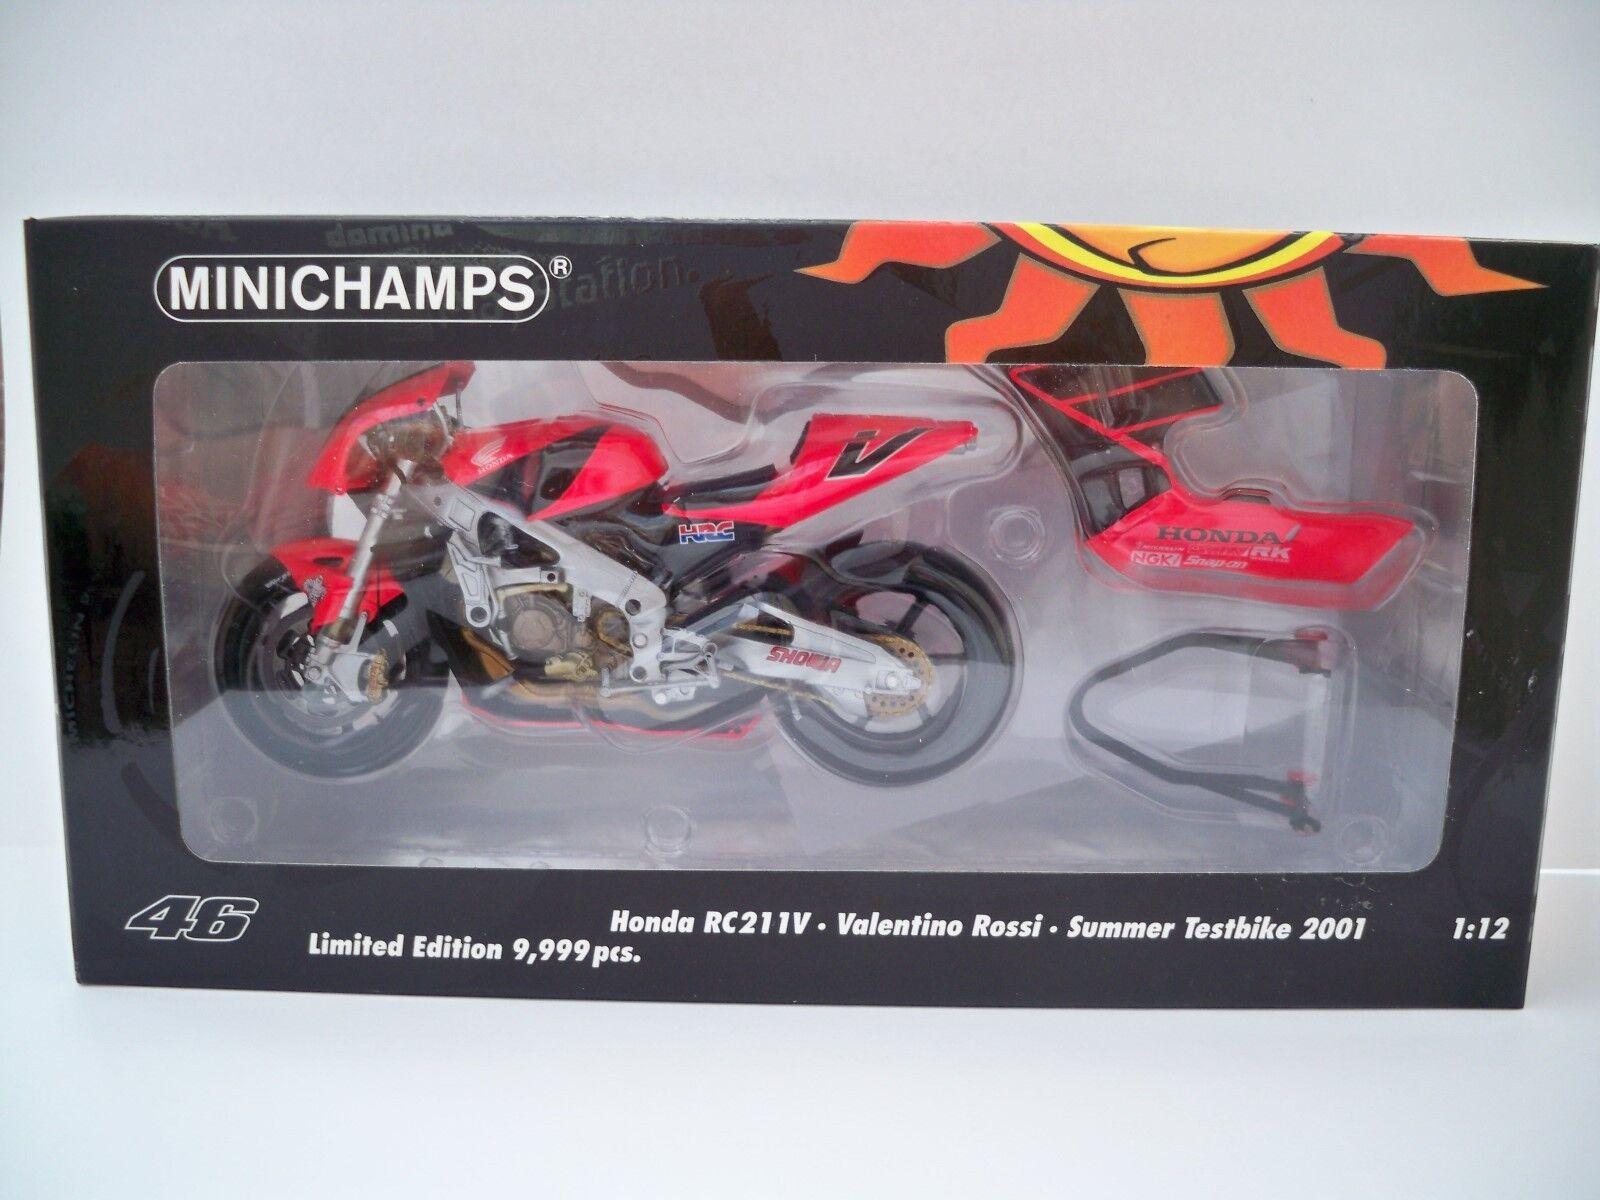 ventas directas de fábrica Minichamps HONDA RC211V Bicicleta de prueba V. V. V. Rossi 2001 1 12 Escala (nuevo)  disfrutando de sus compras